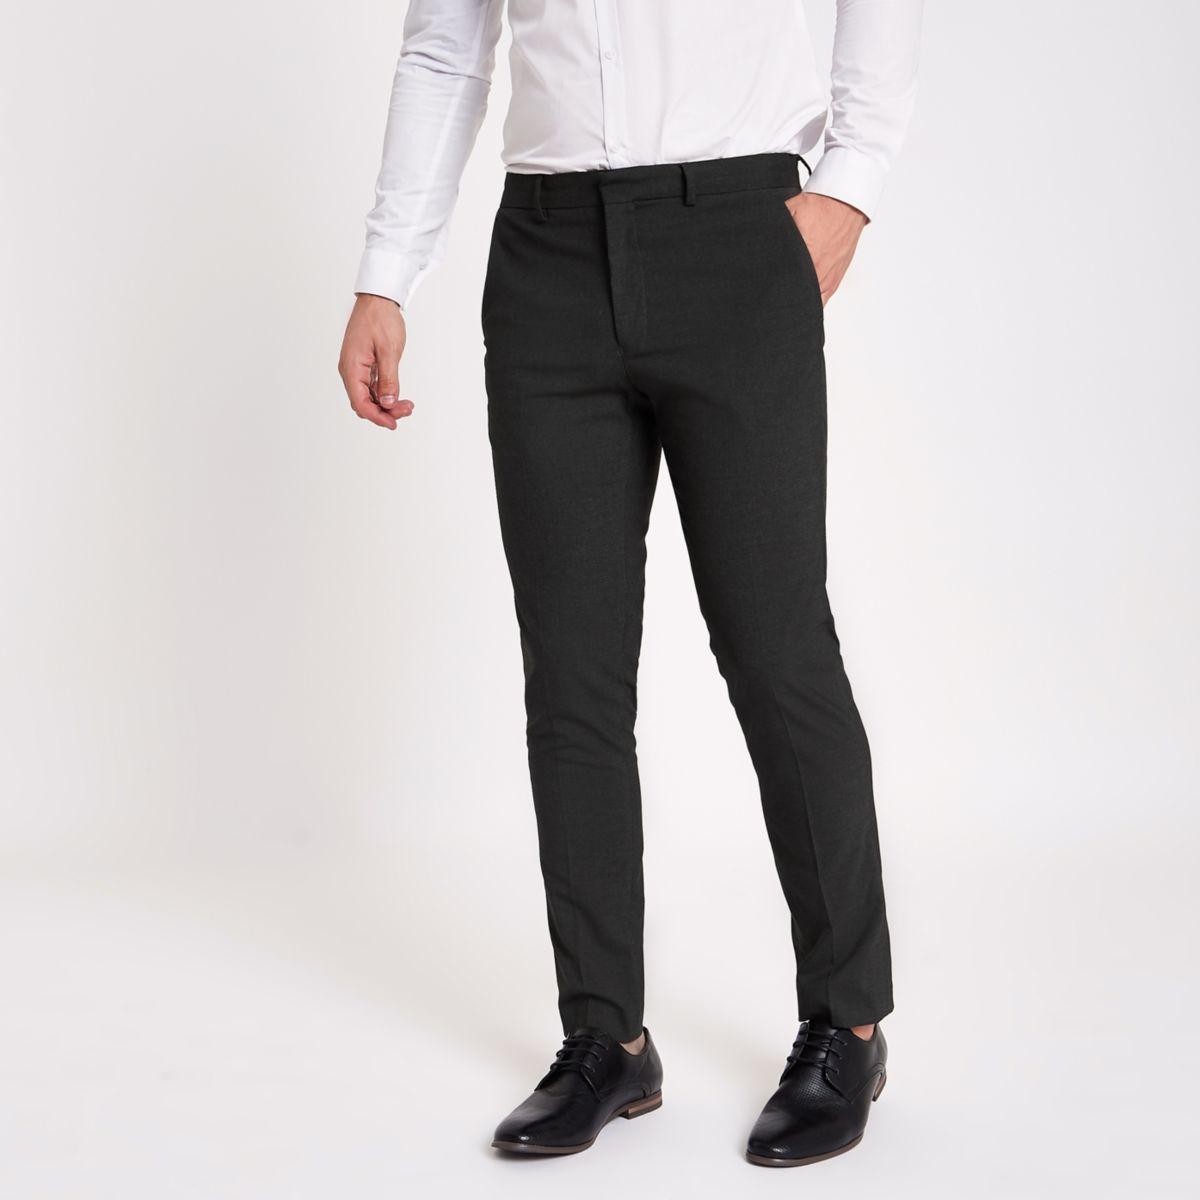 pantalon habill gris coupe skinny pantalons habill s. Black Bedroom Furniture Sets. Home Design Ideas